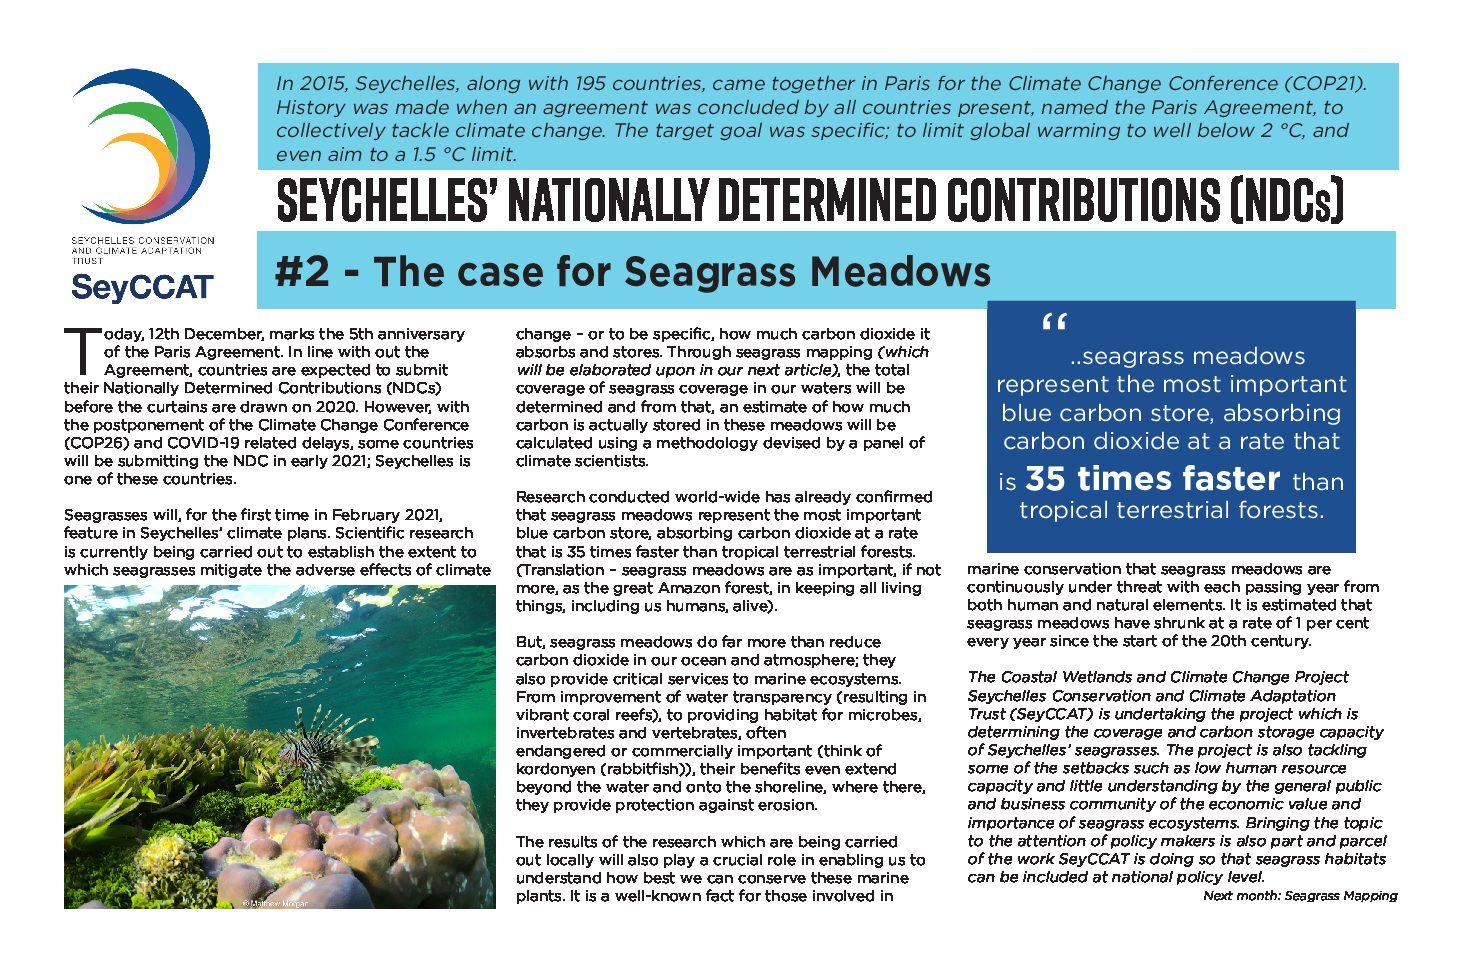 SeyCCAT commemorates 5th anniversary of Paris Agreement